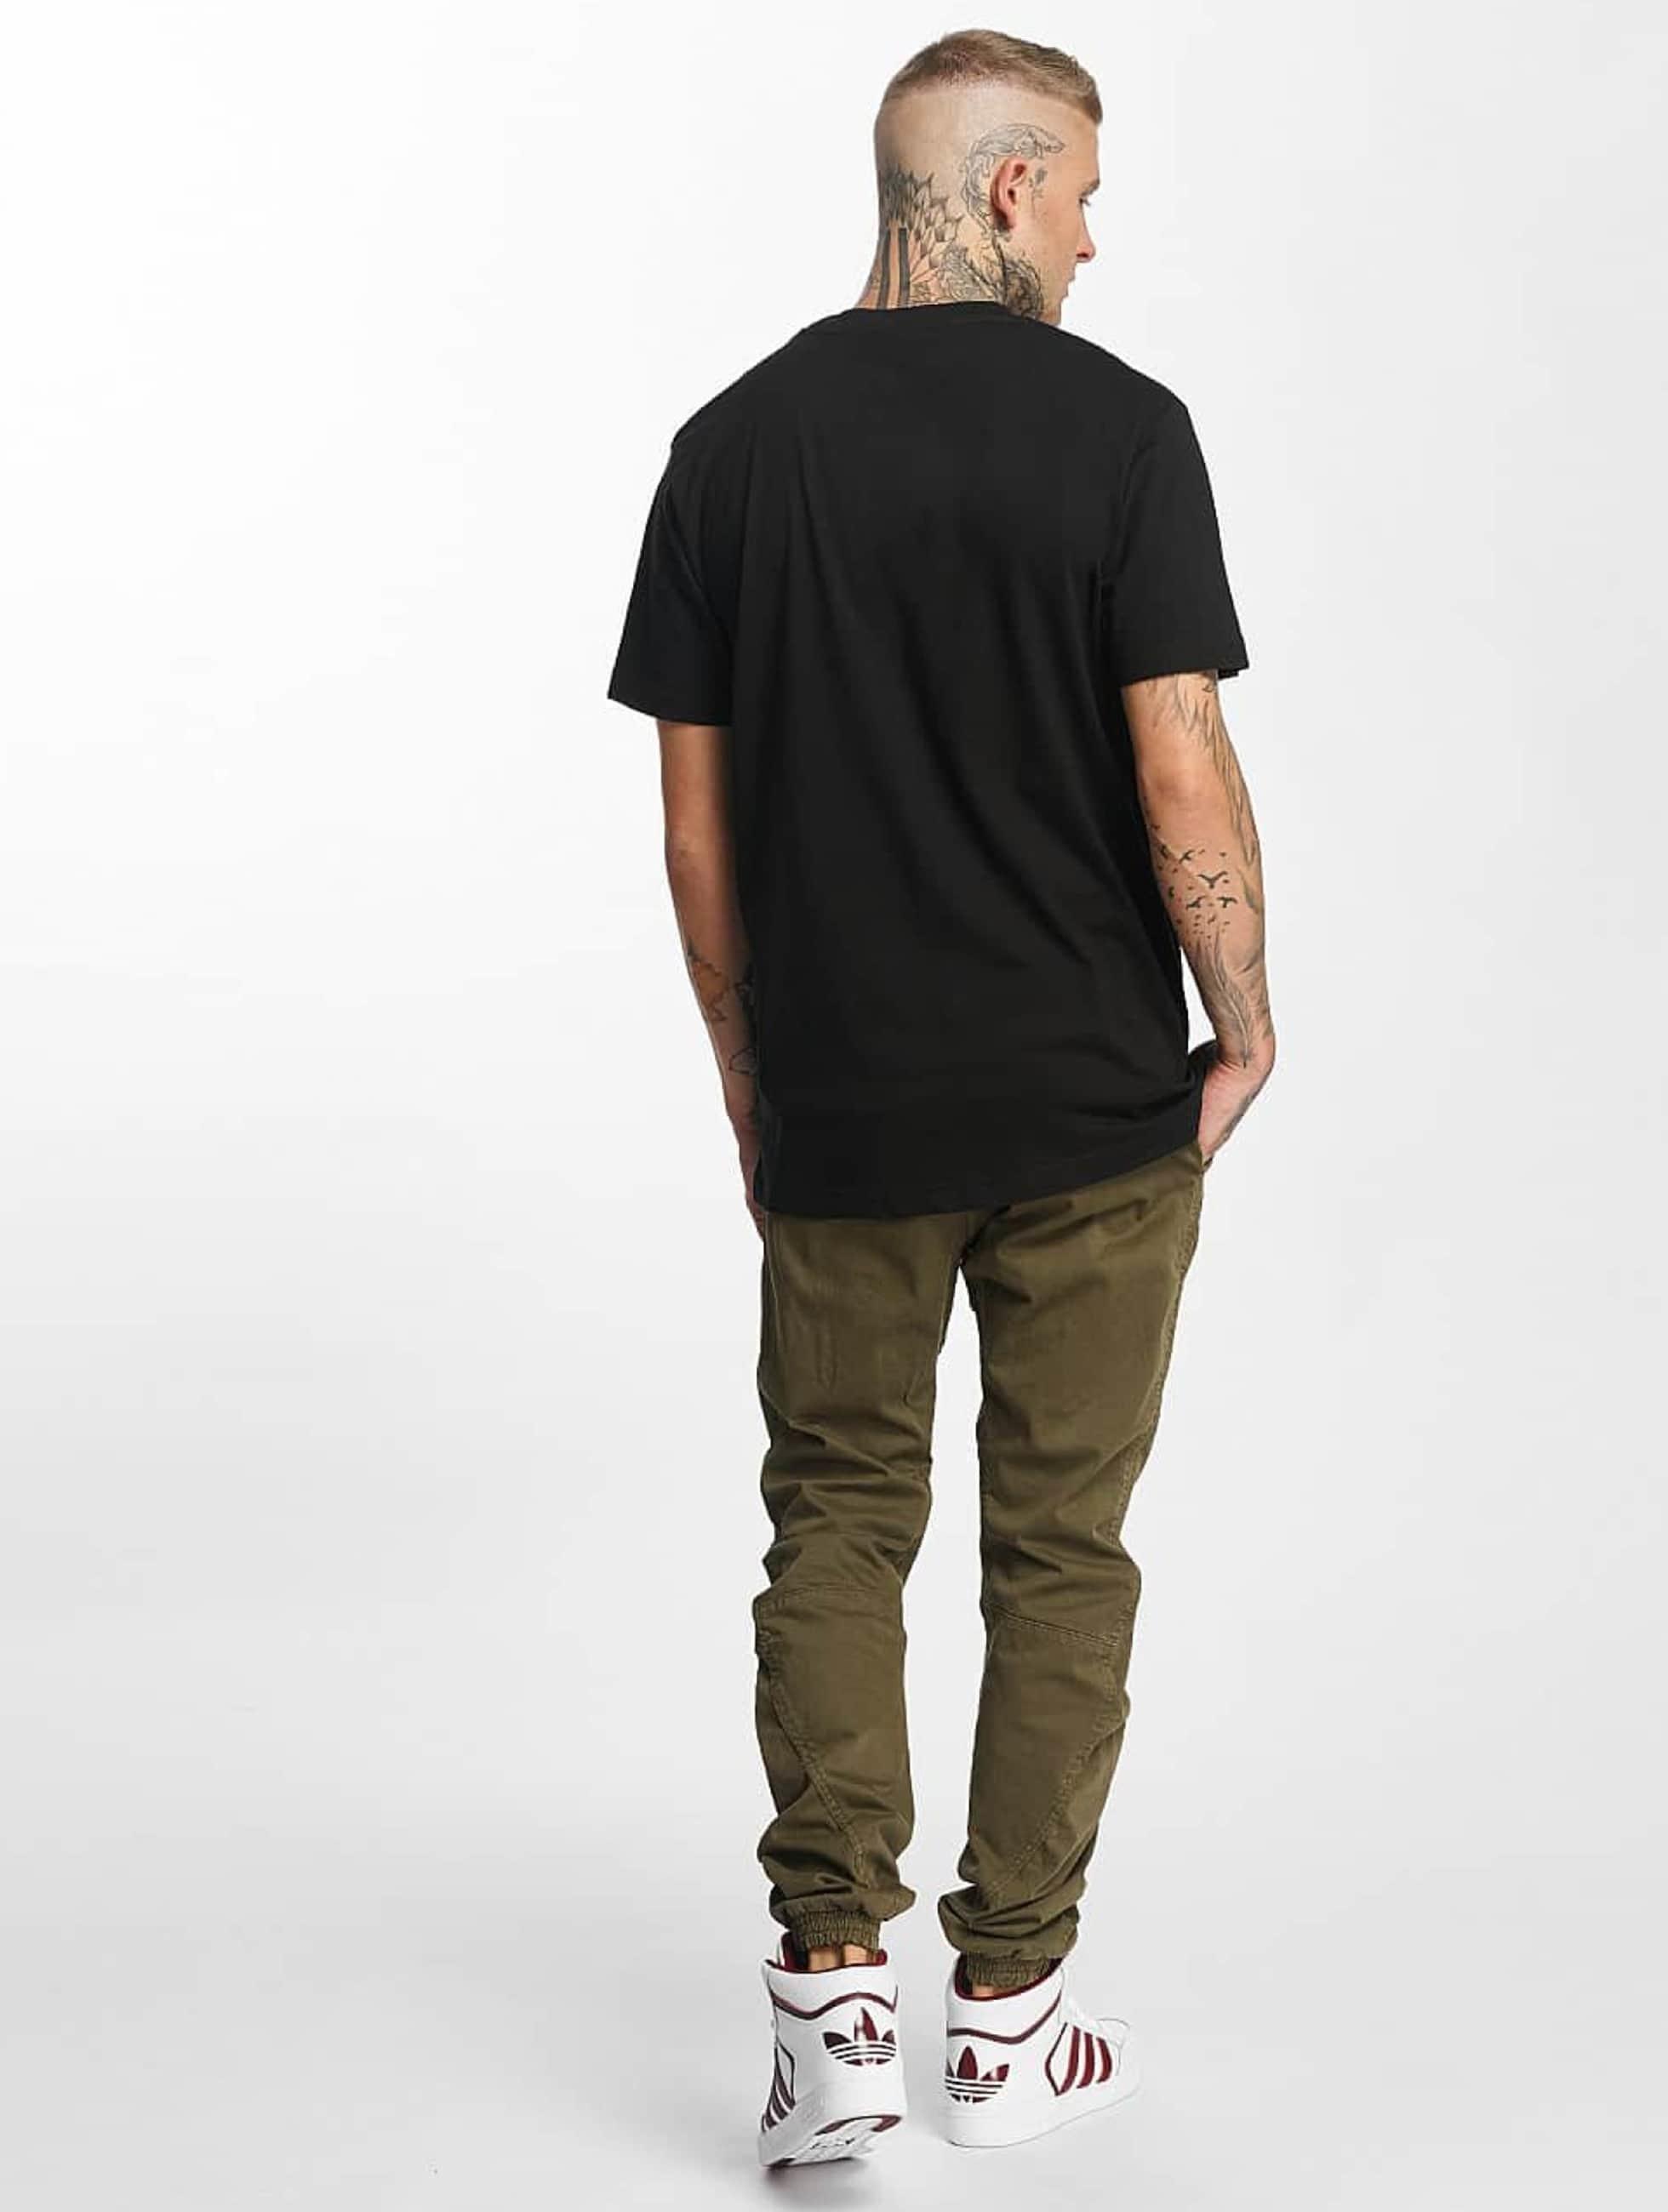 Mister Tee T-Shirt Bob Marley Roots schwarz